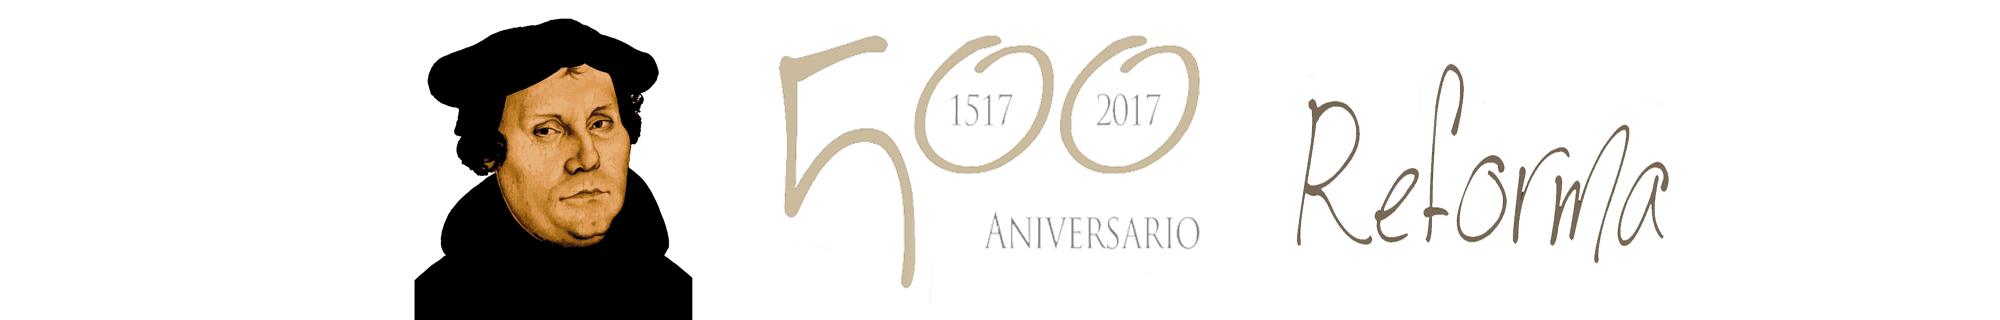 500 Aniversario de la Reforma en SEUT